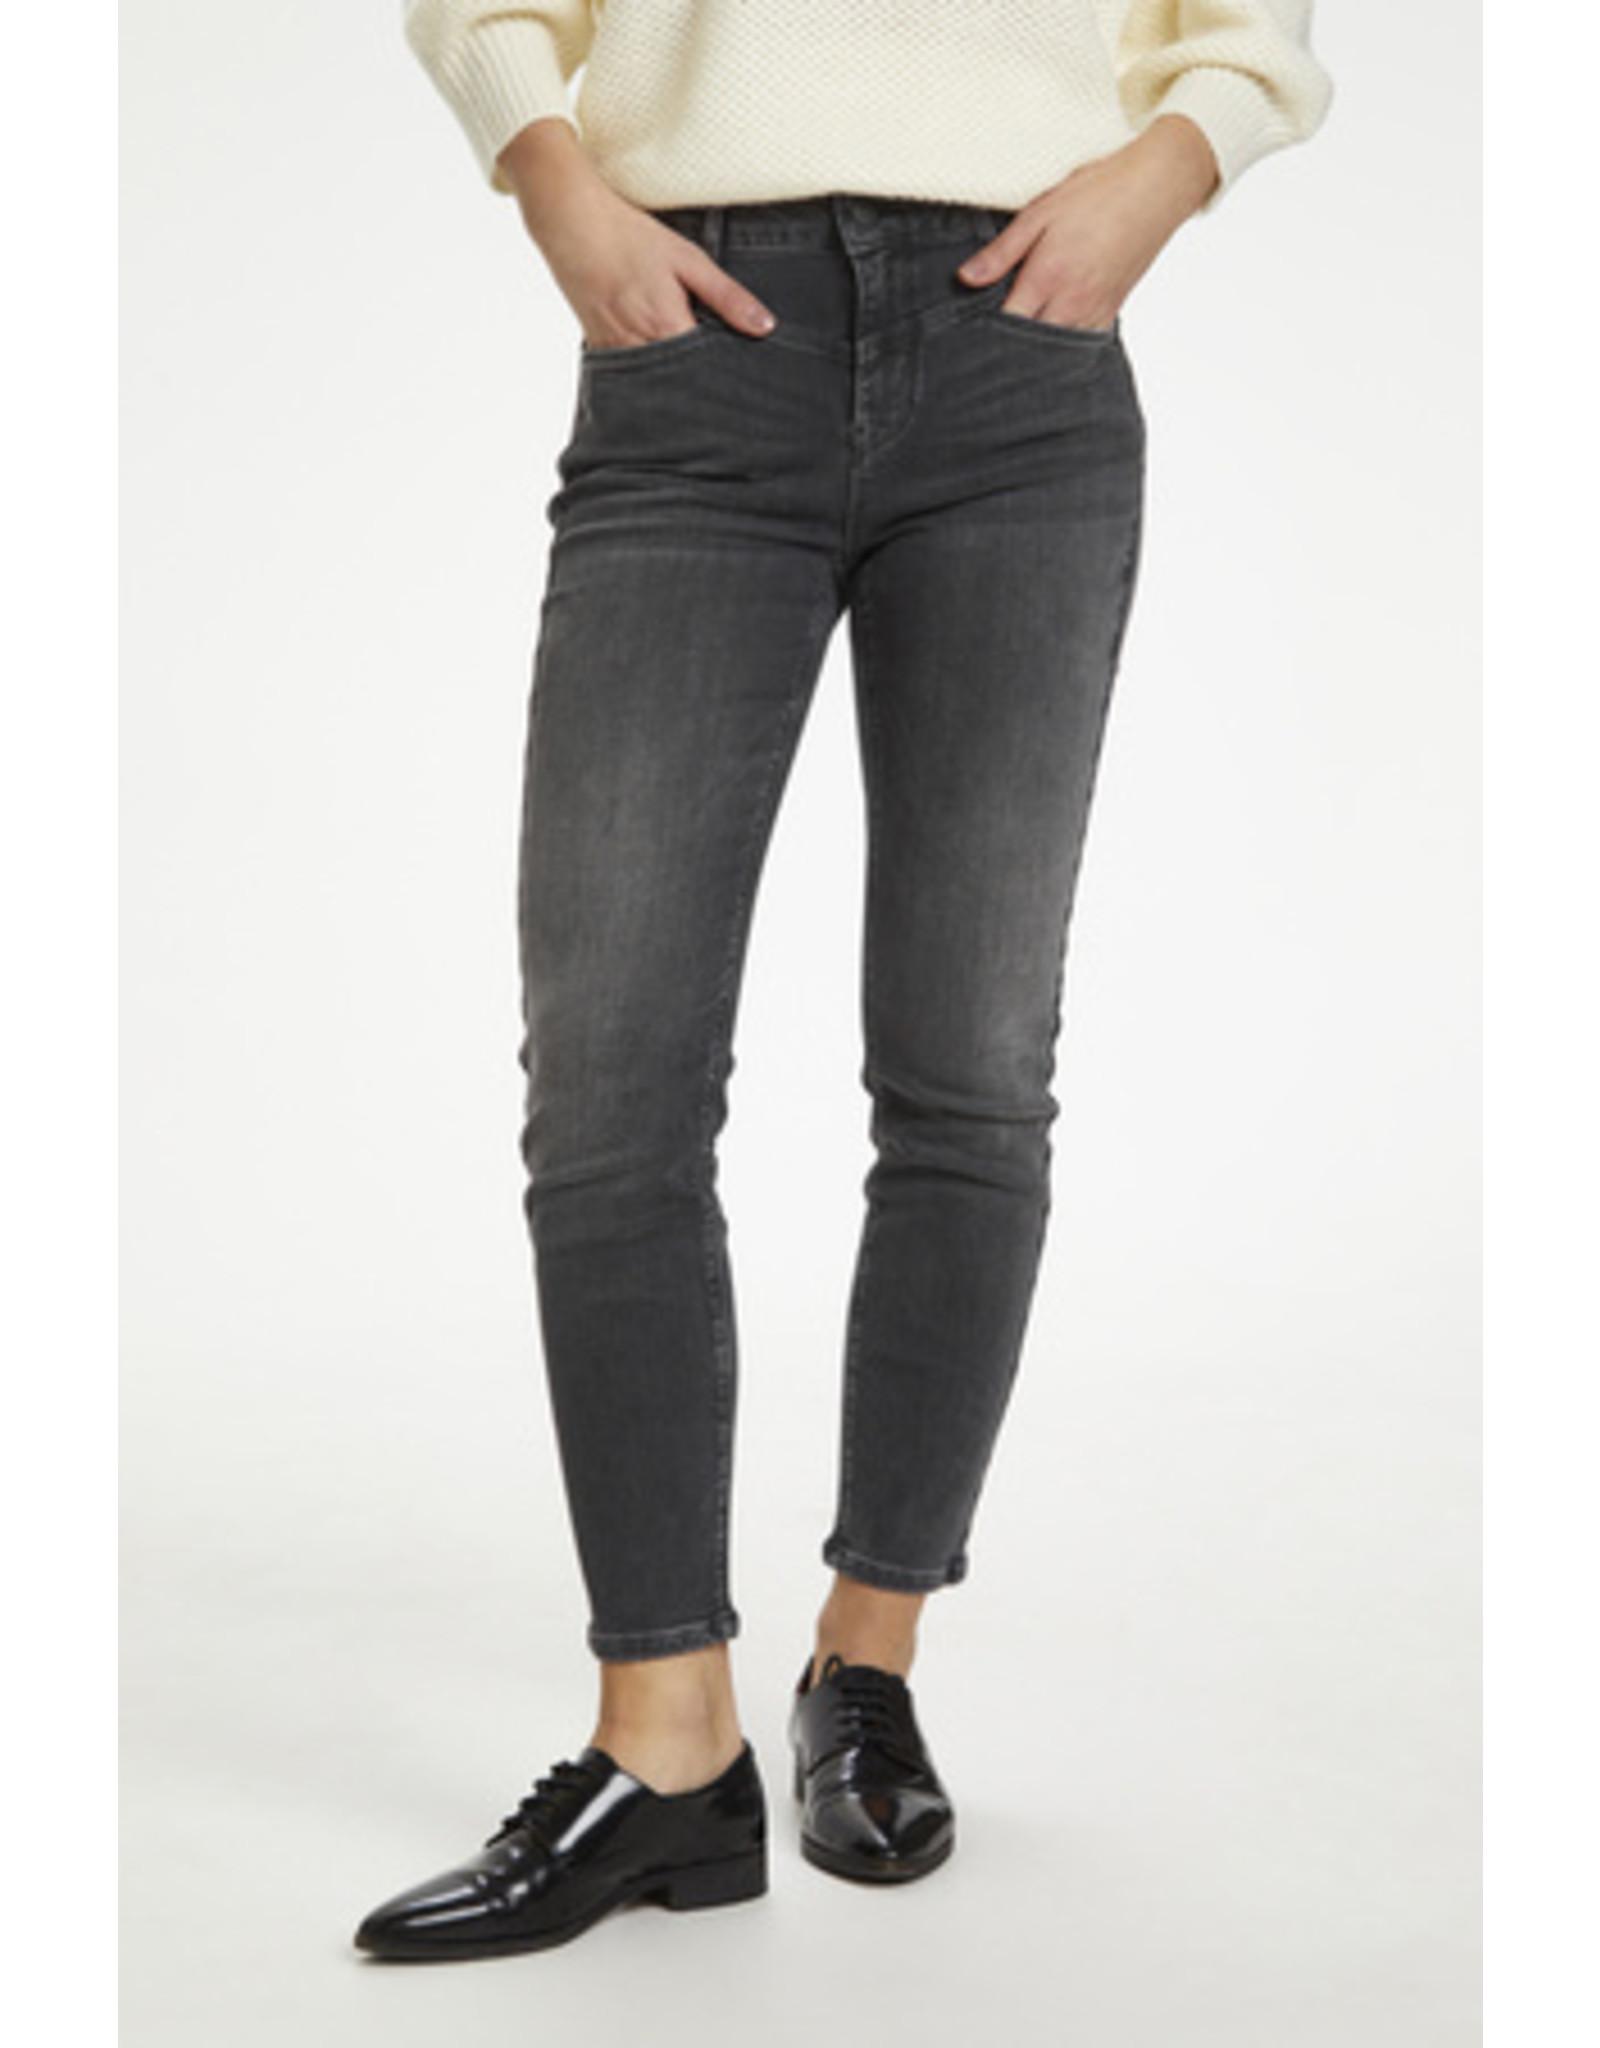 Kaffe Hadley Denim Jeans